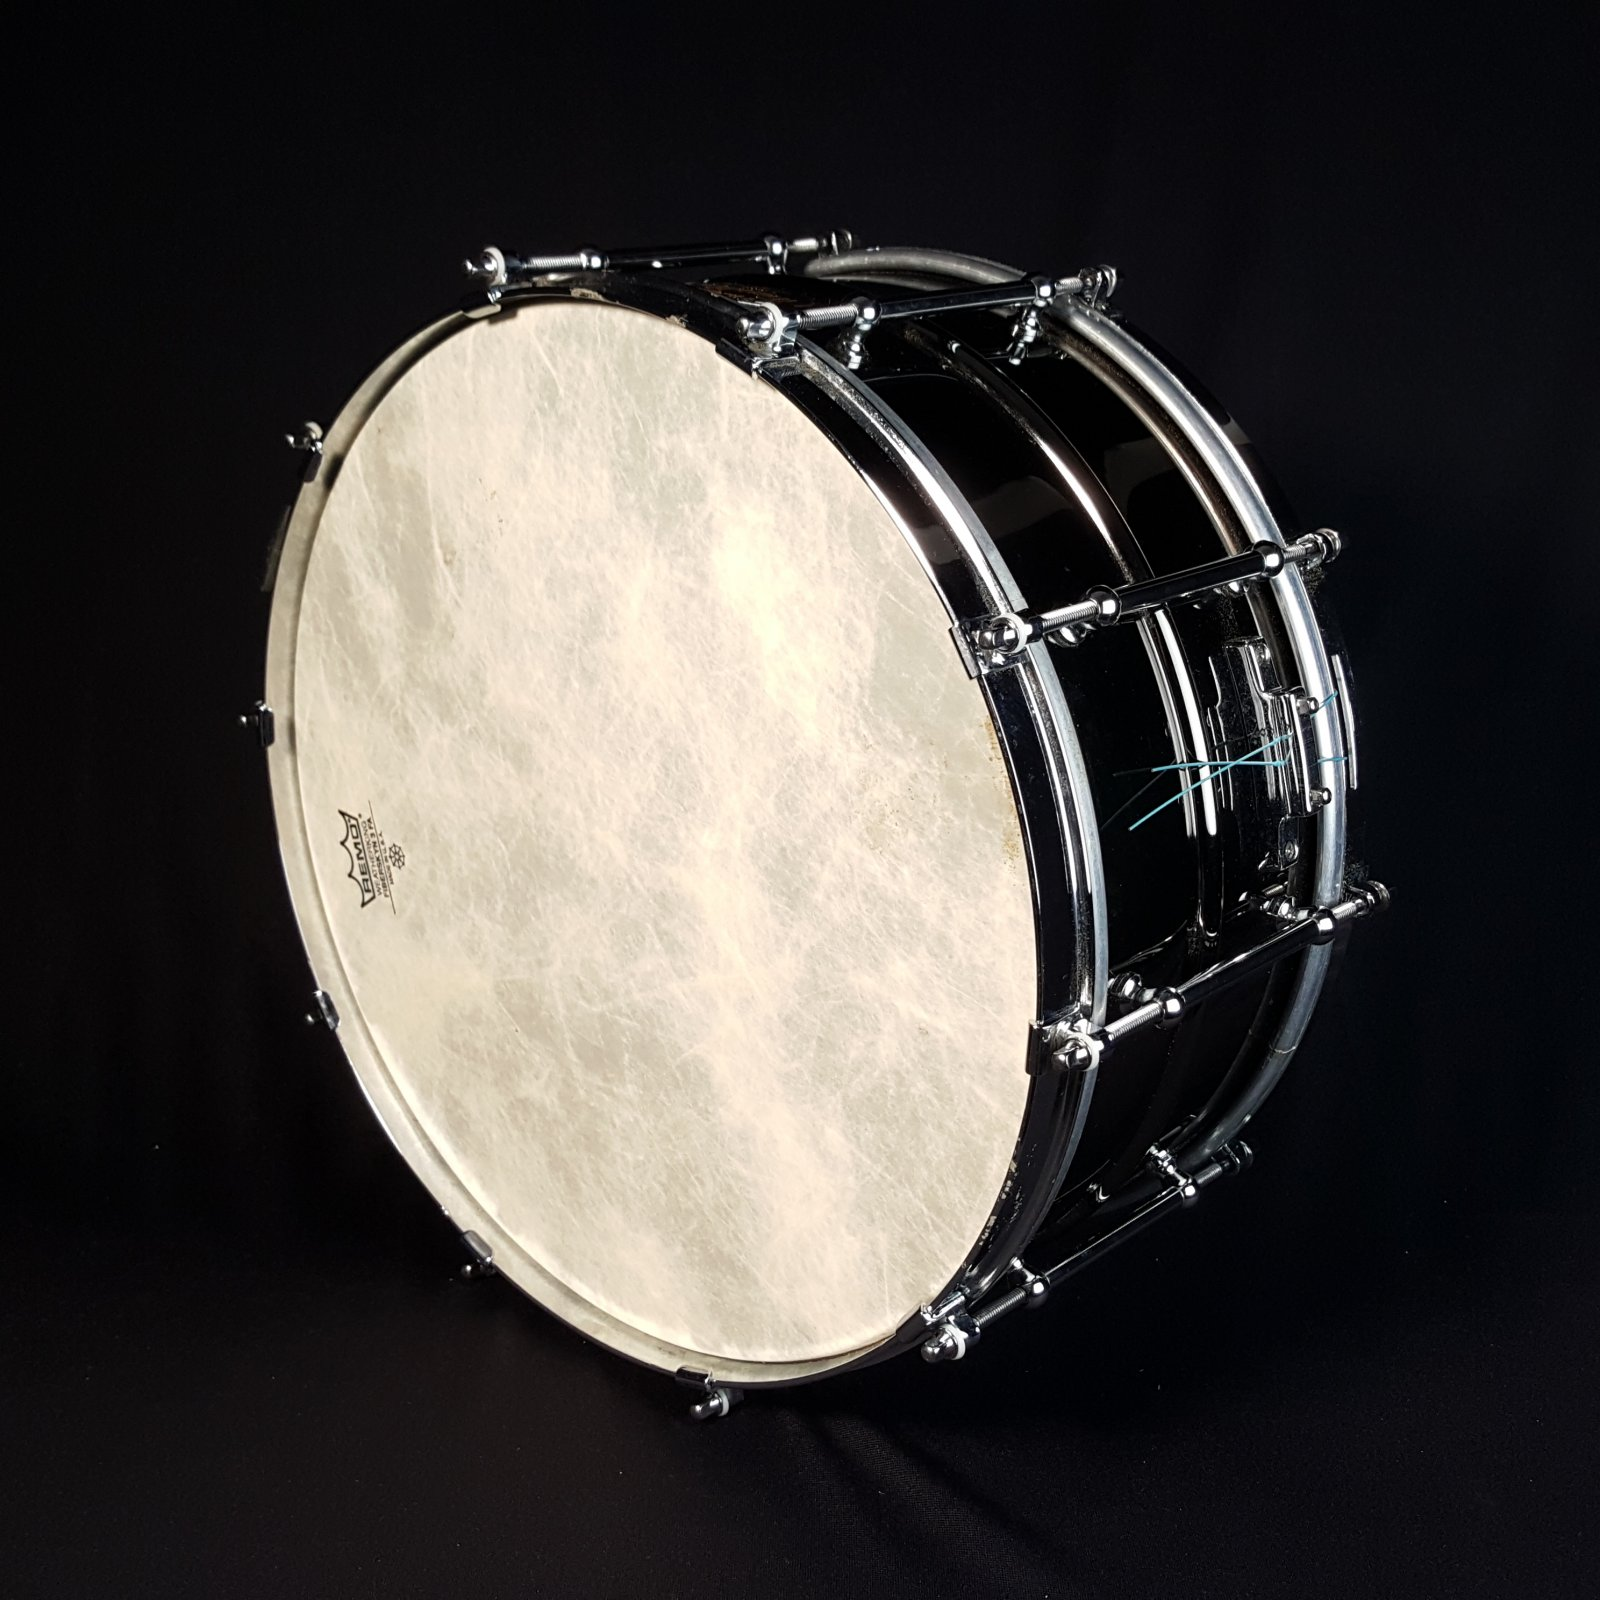 USED Vintage World Max Black Hawg 6.5 x 14 Snare Drum